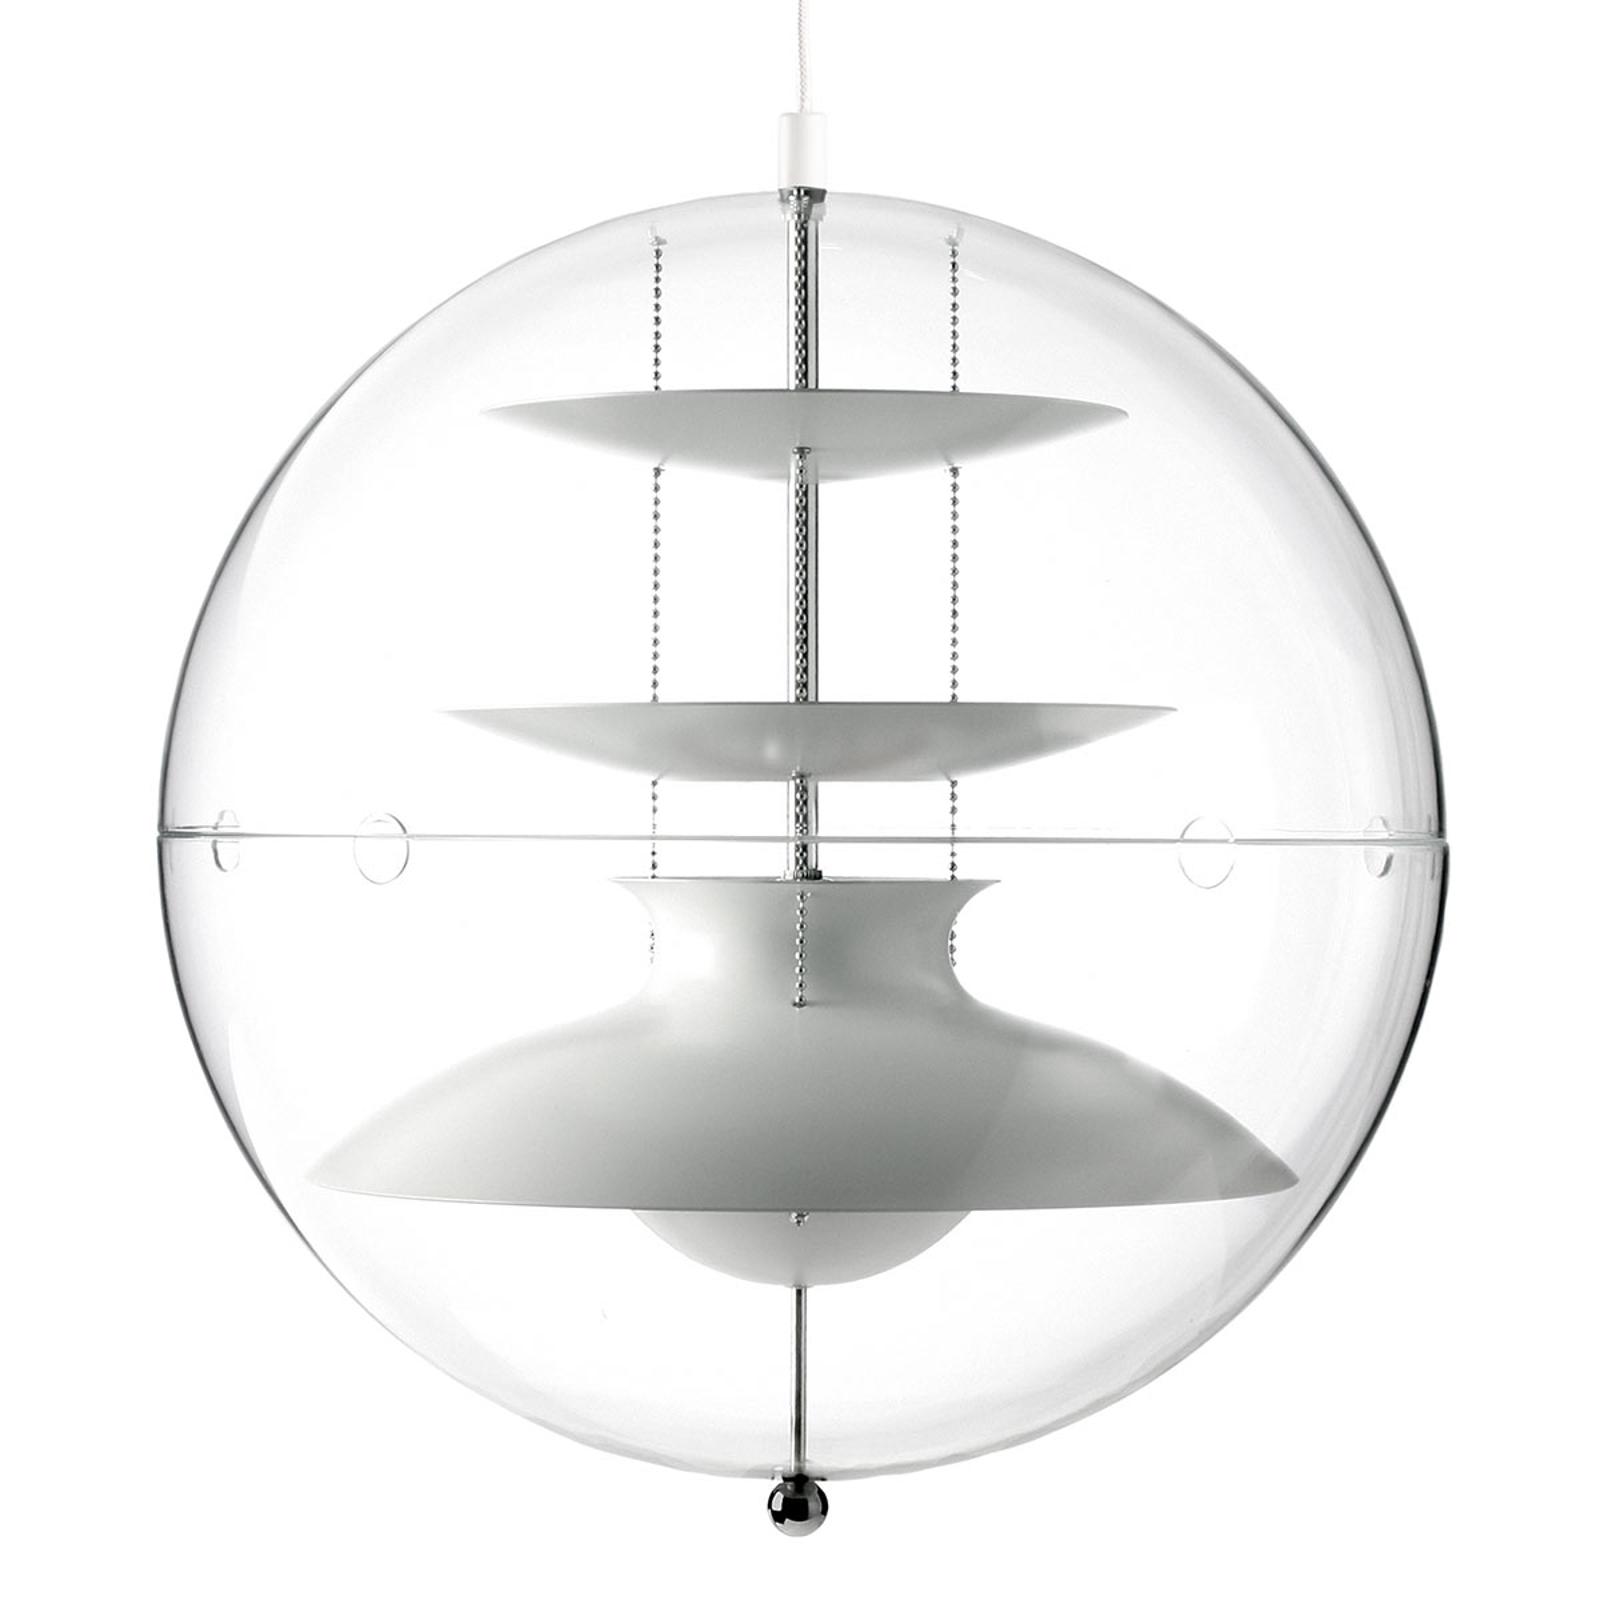 VERPAN Panto lampa wisząca, 50 cm